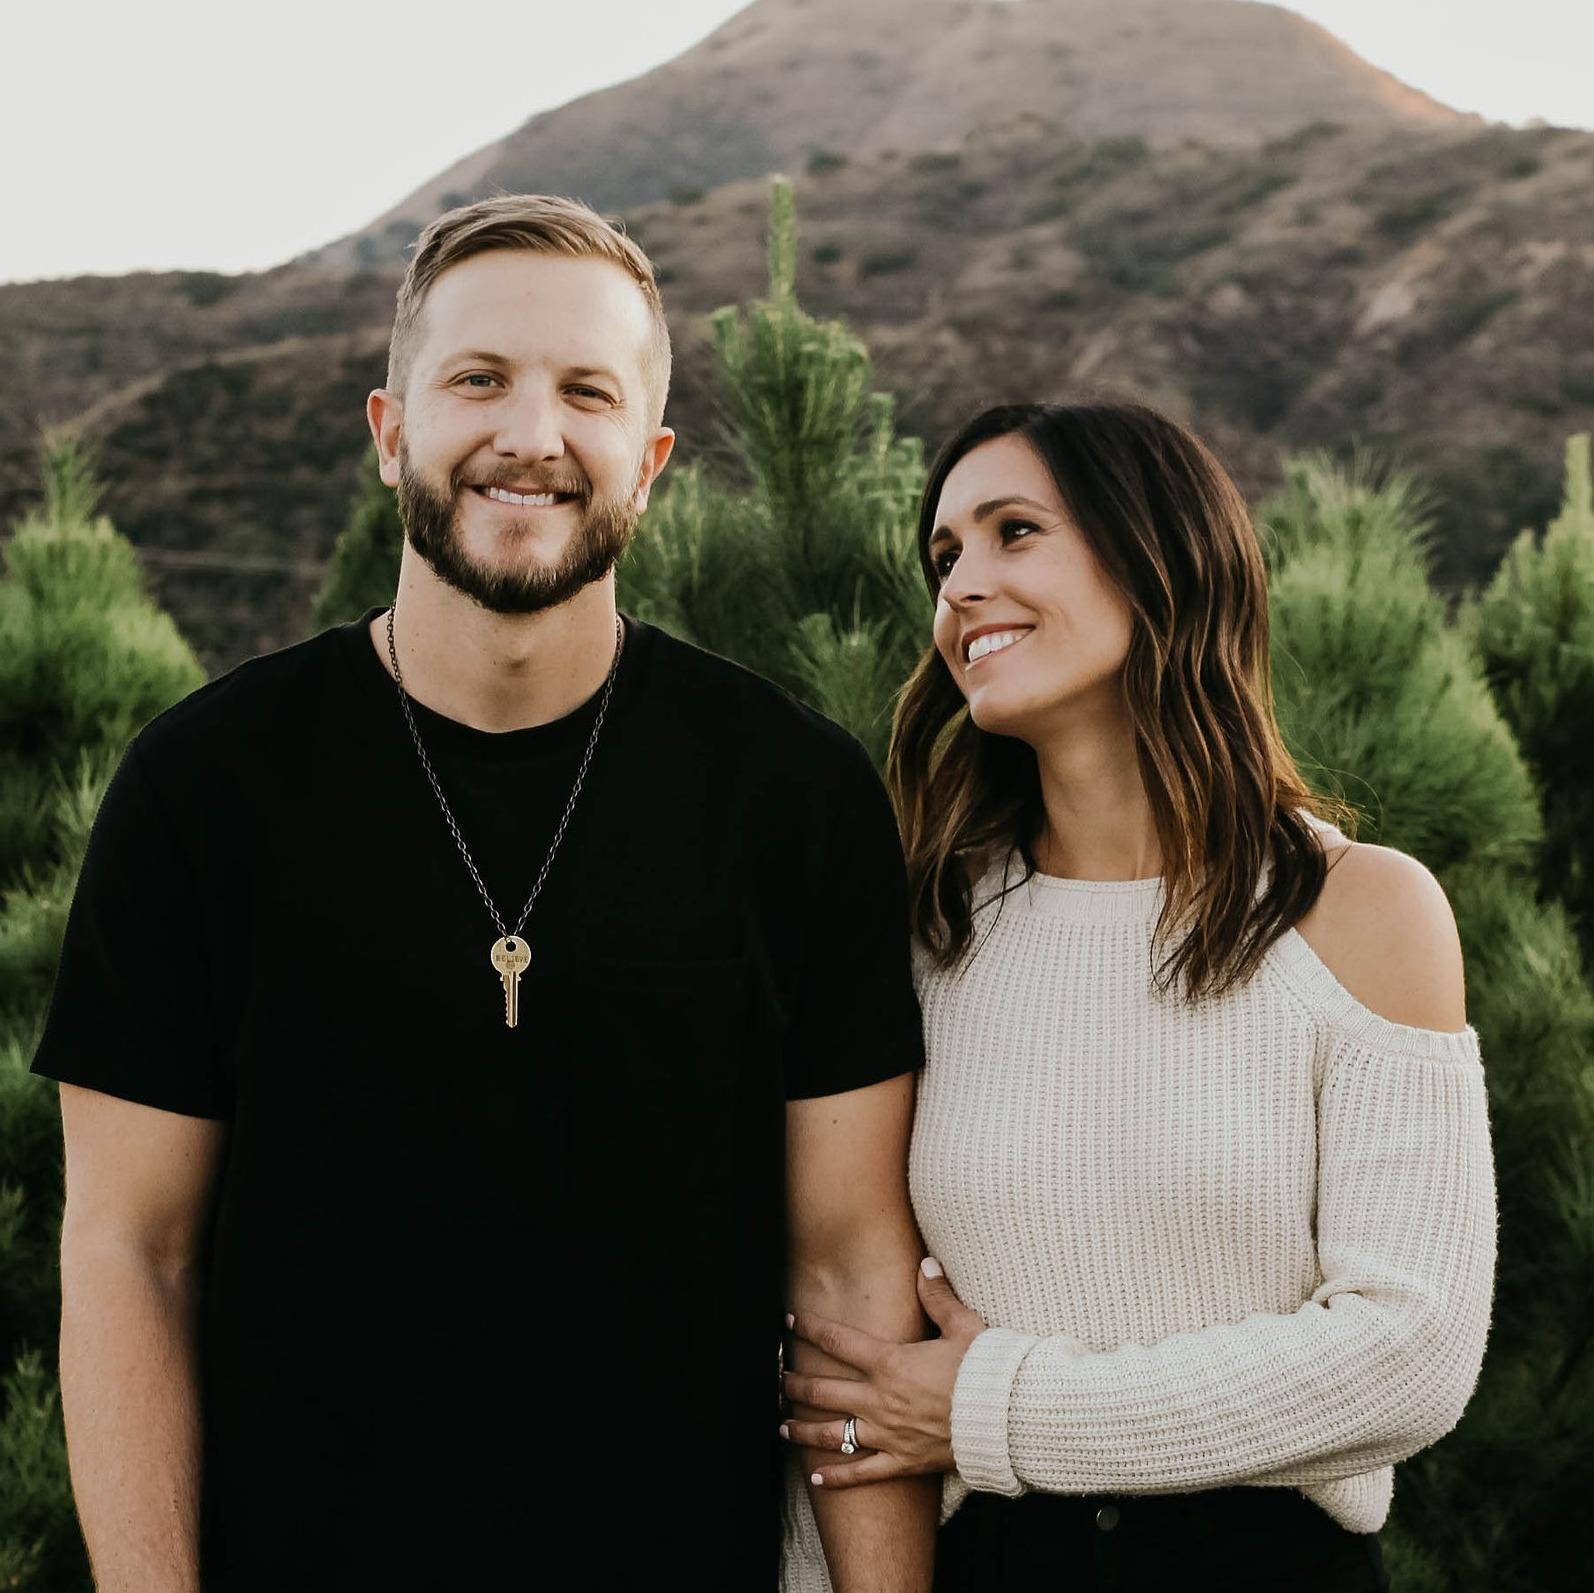 Pastor Brenen and Morgan